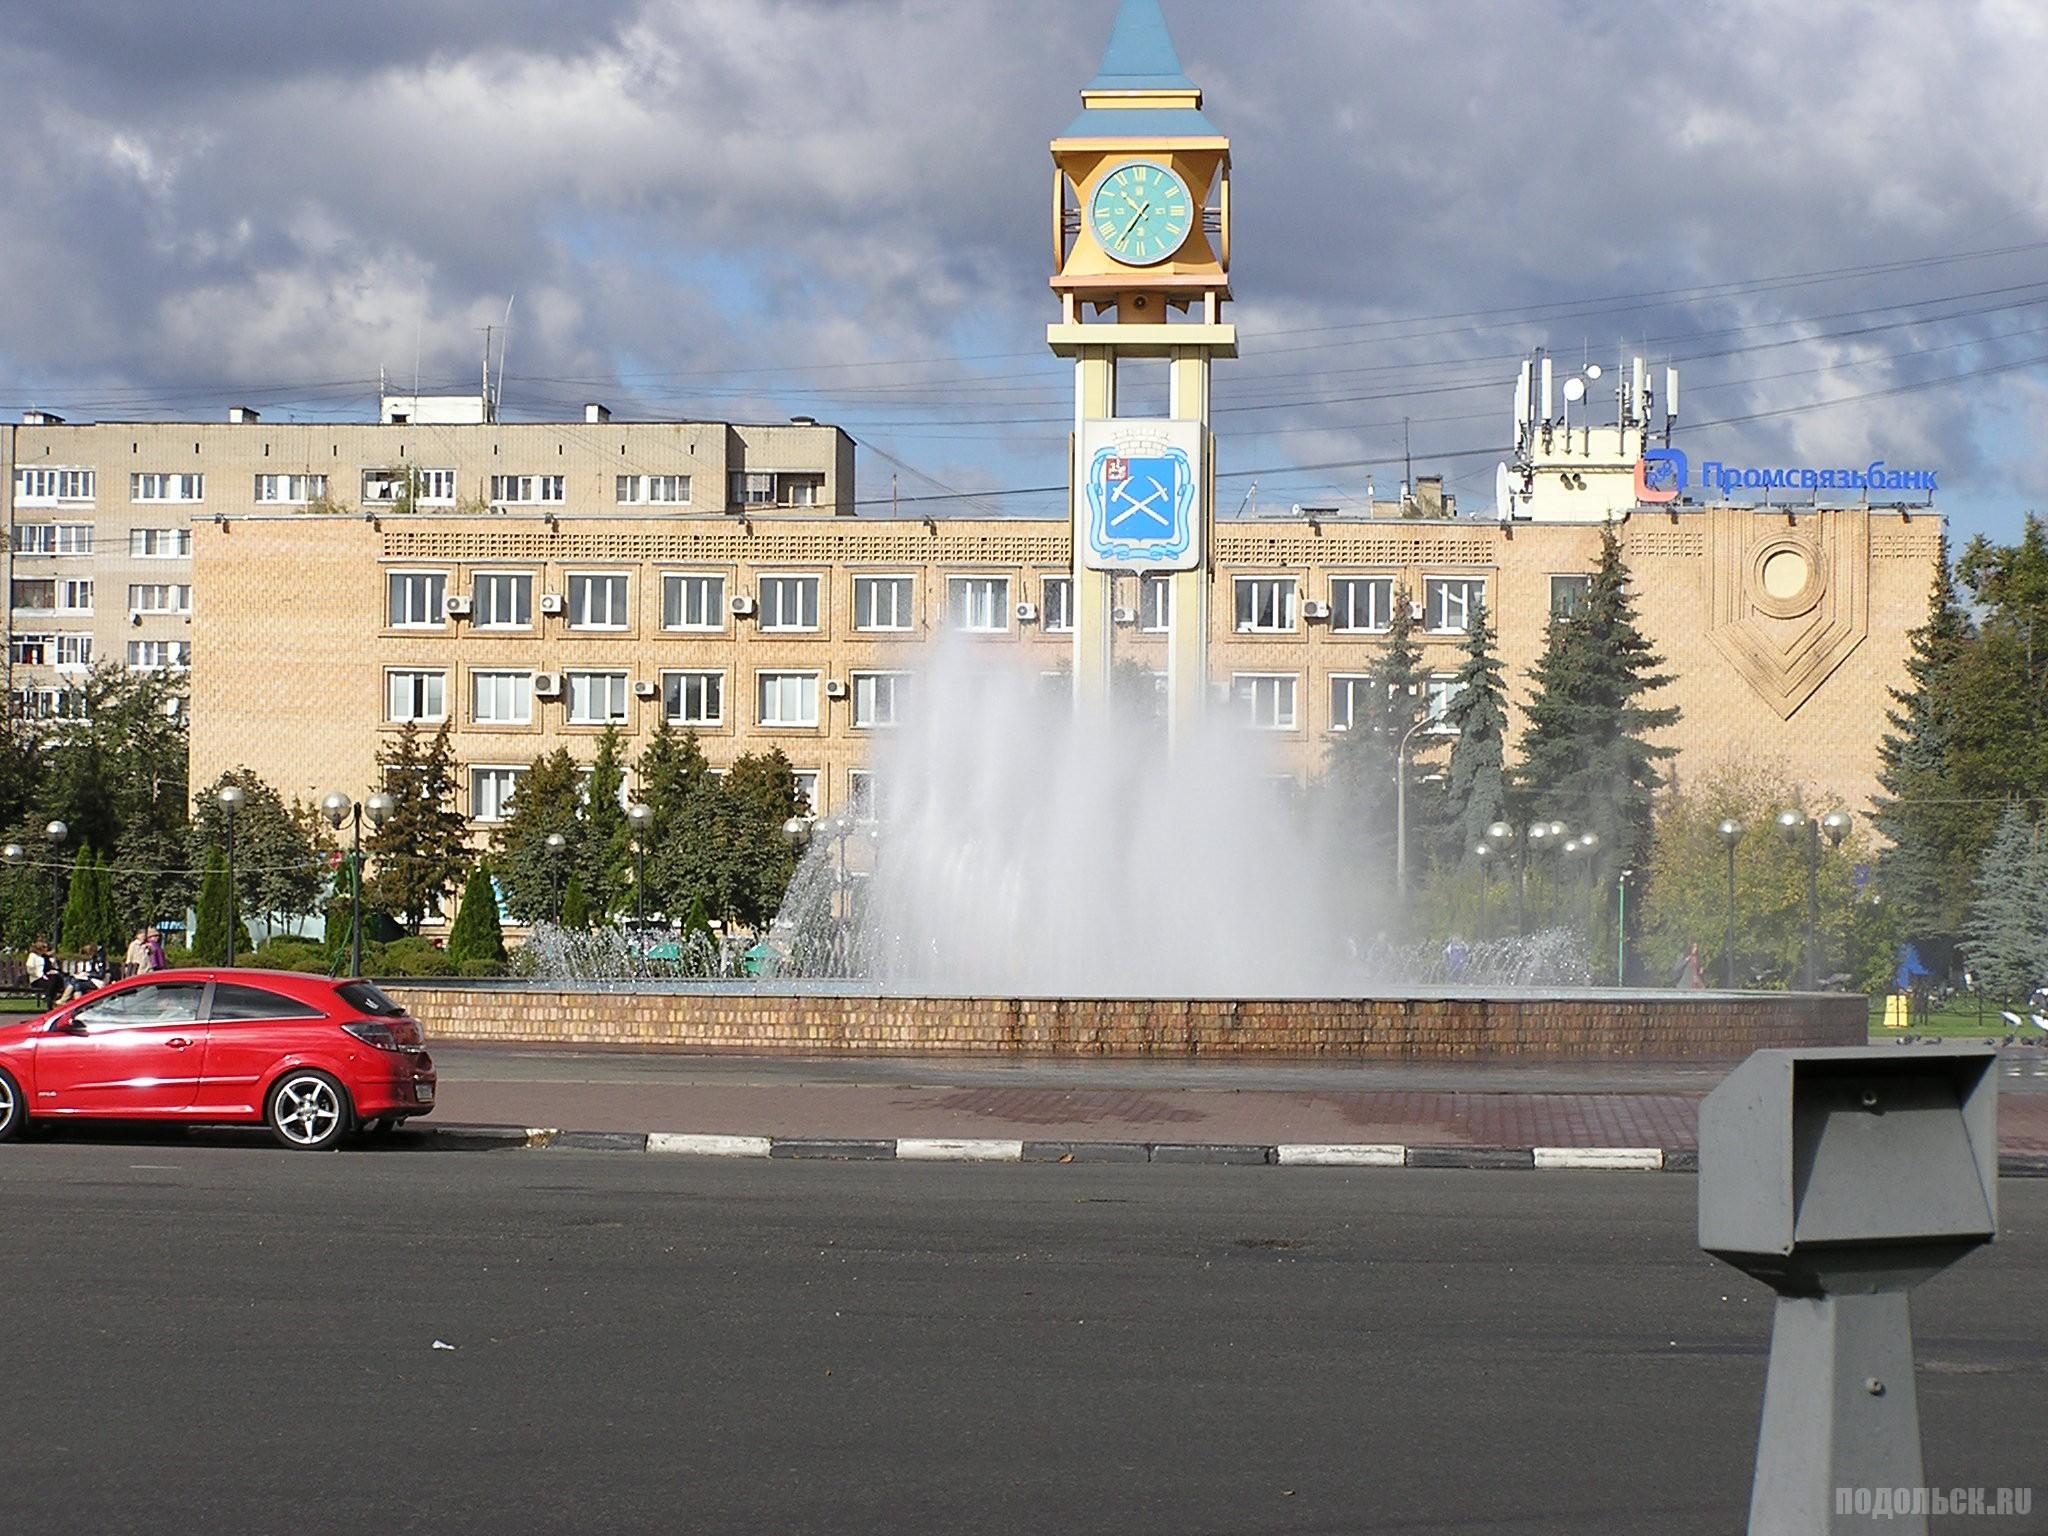 Площадь Ленина 3 октября.